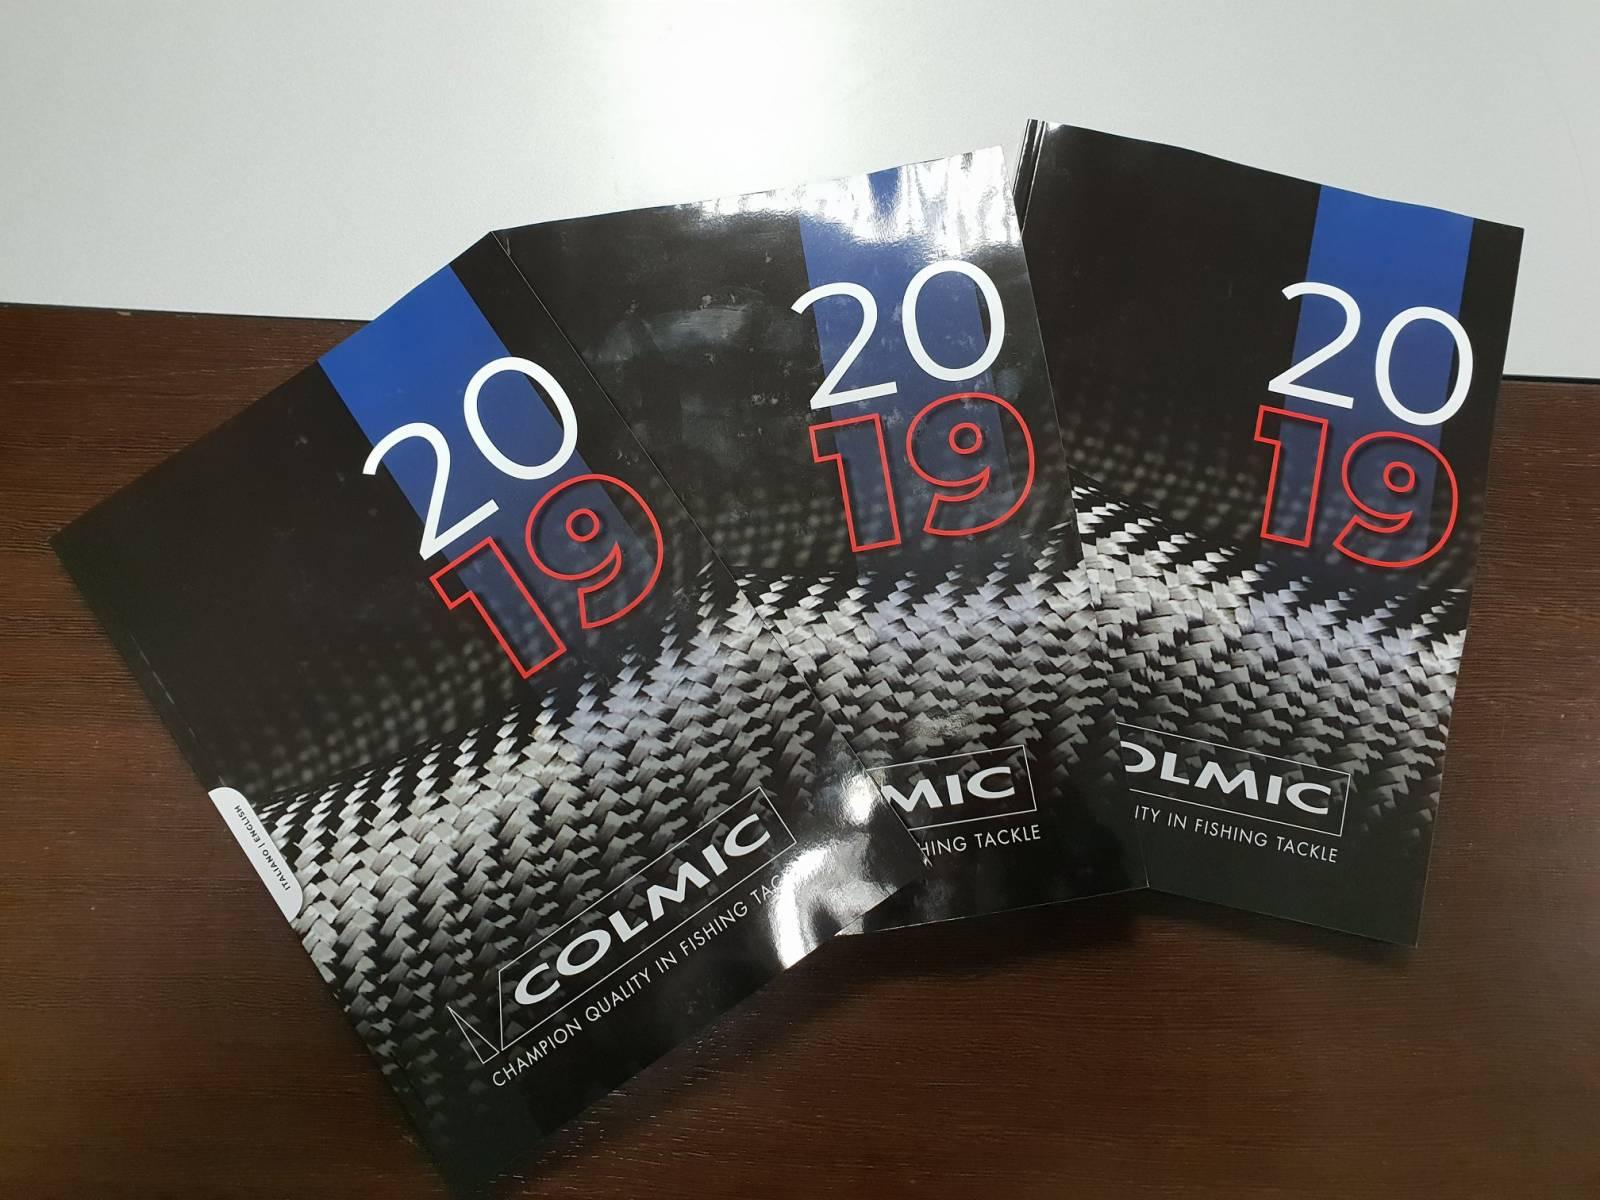 Catalogo Colmic 2019